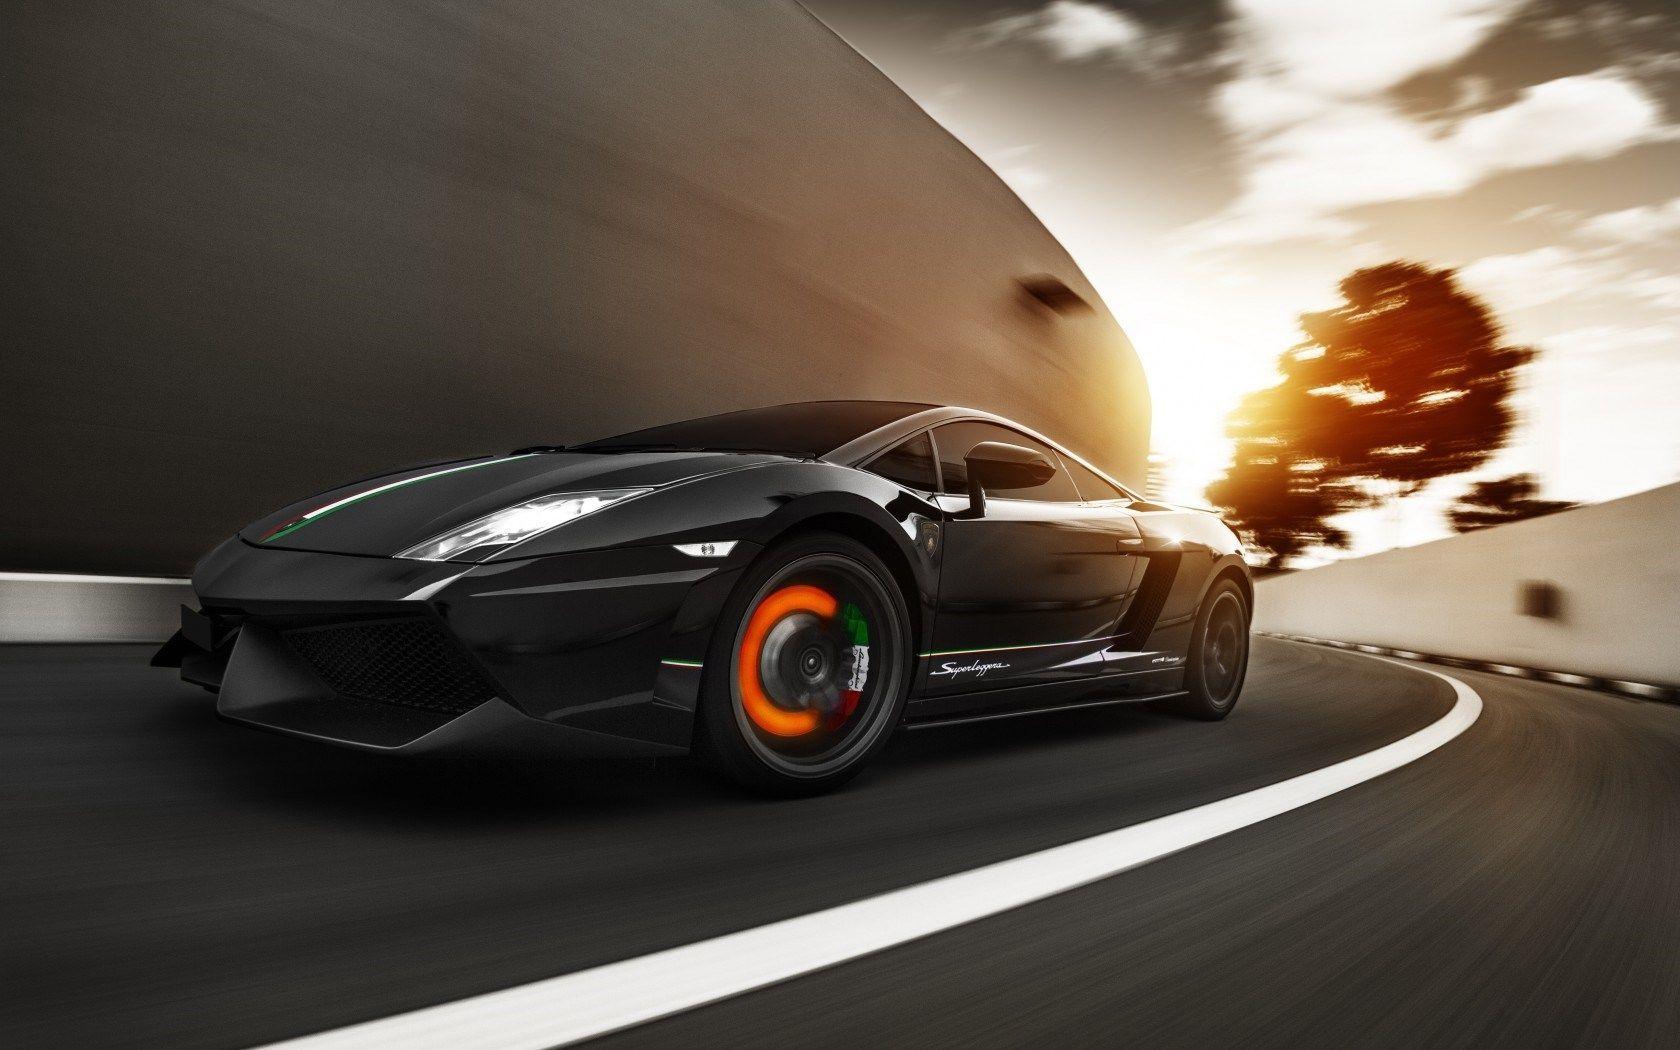 Best Live Wallpaper HD Lamborghini Gallardo 2016